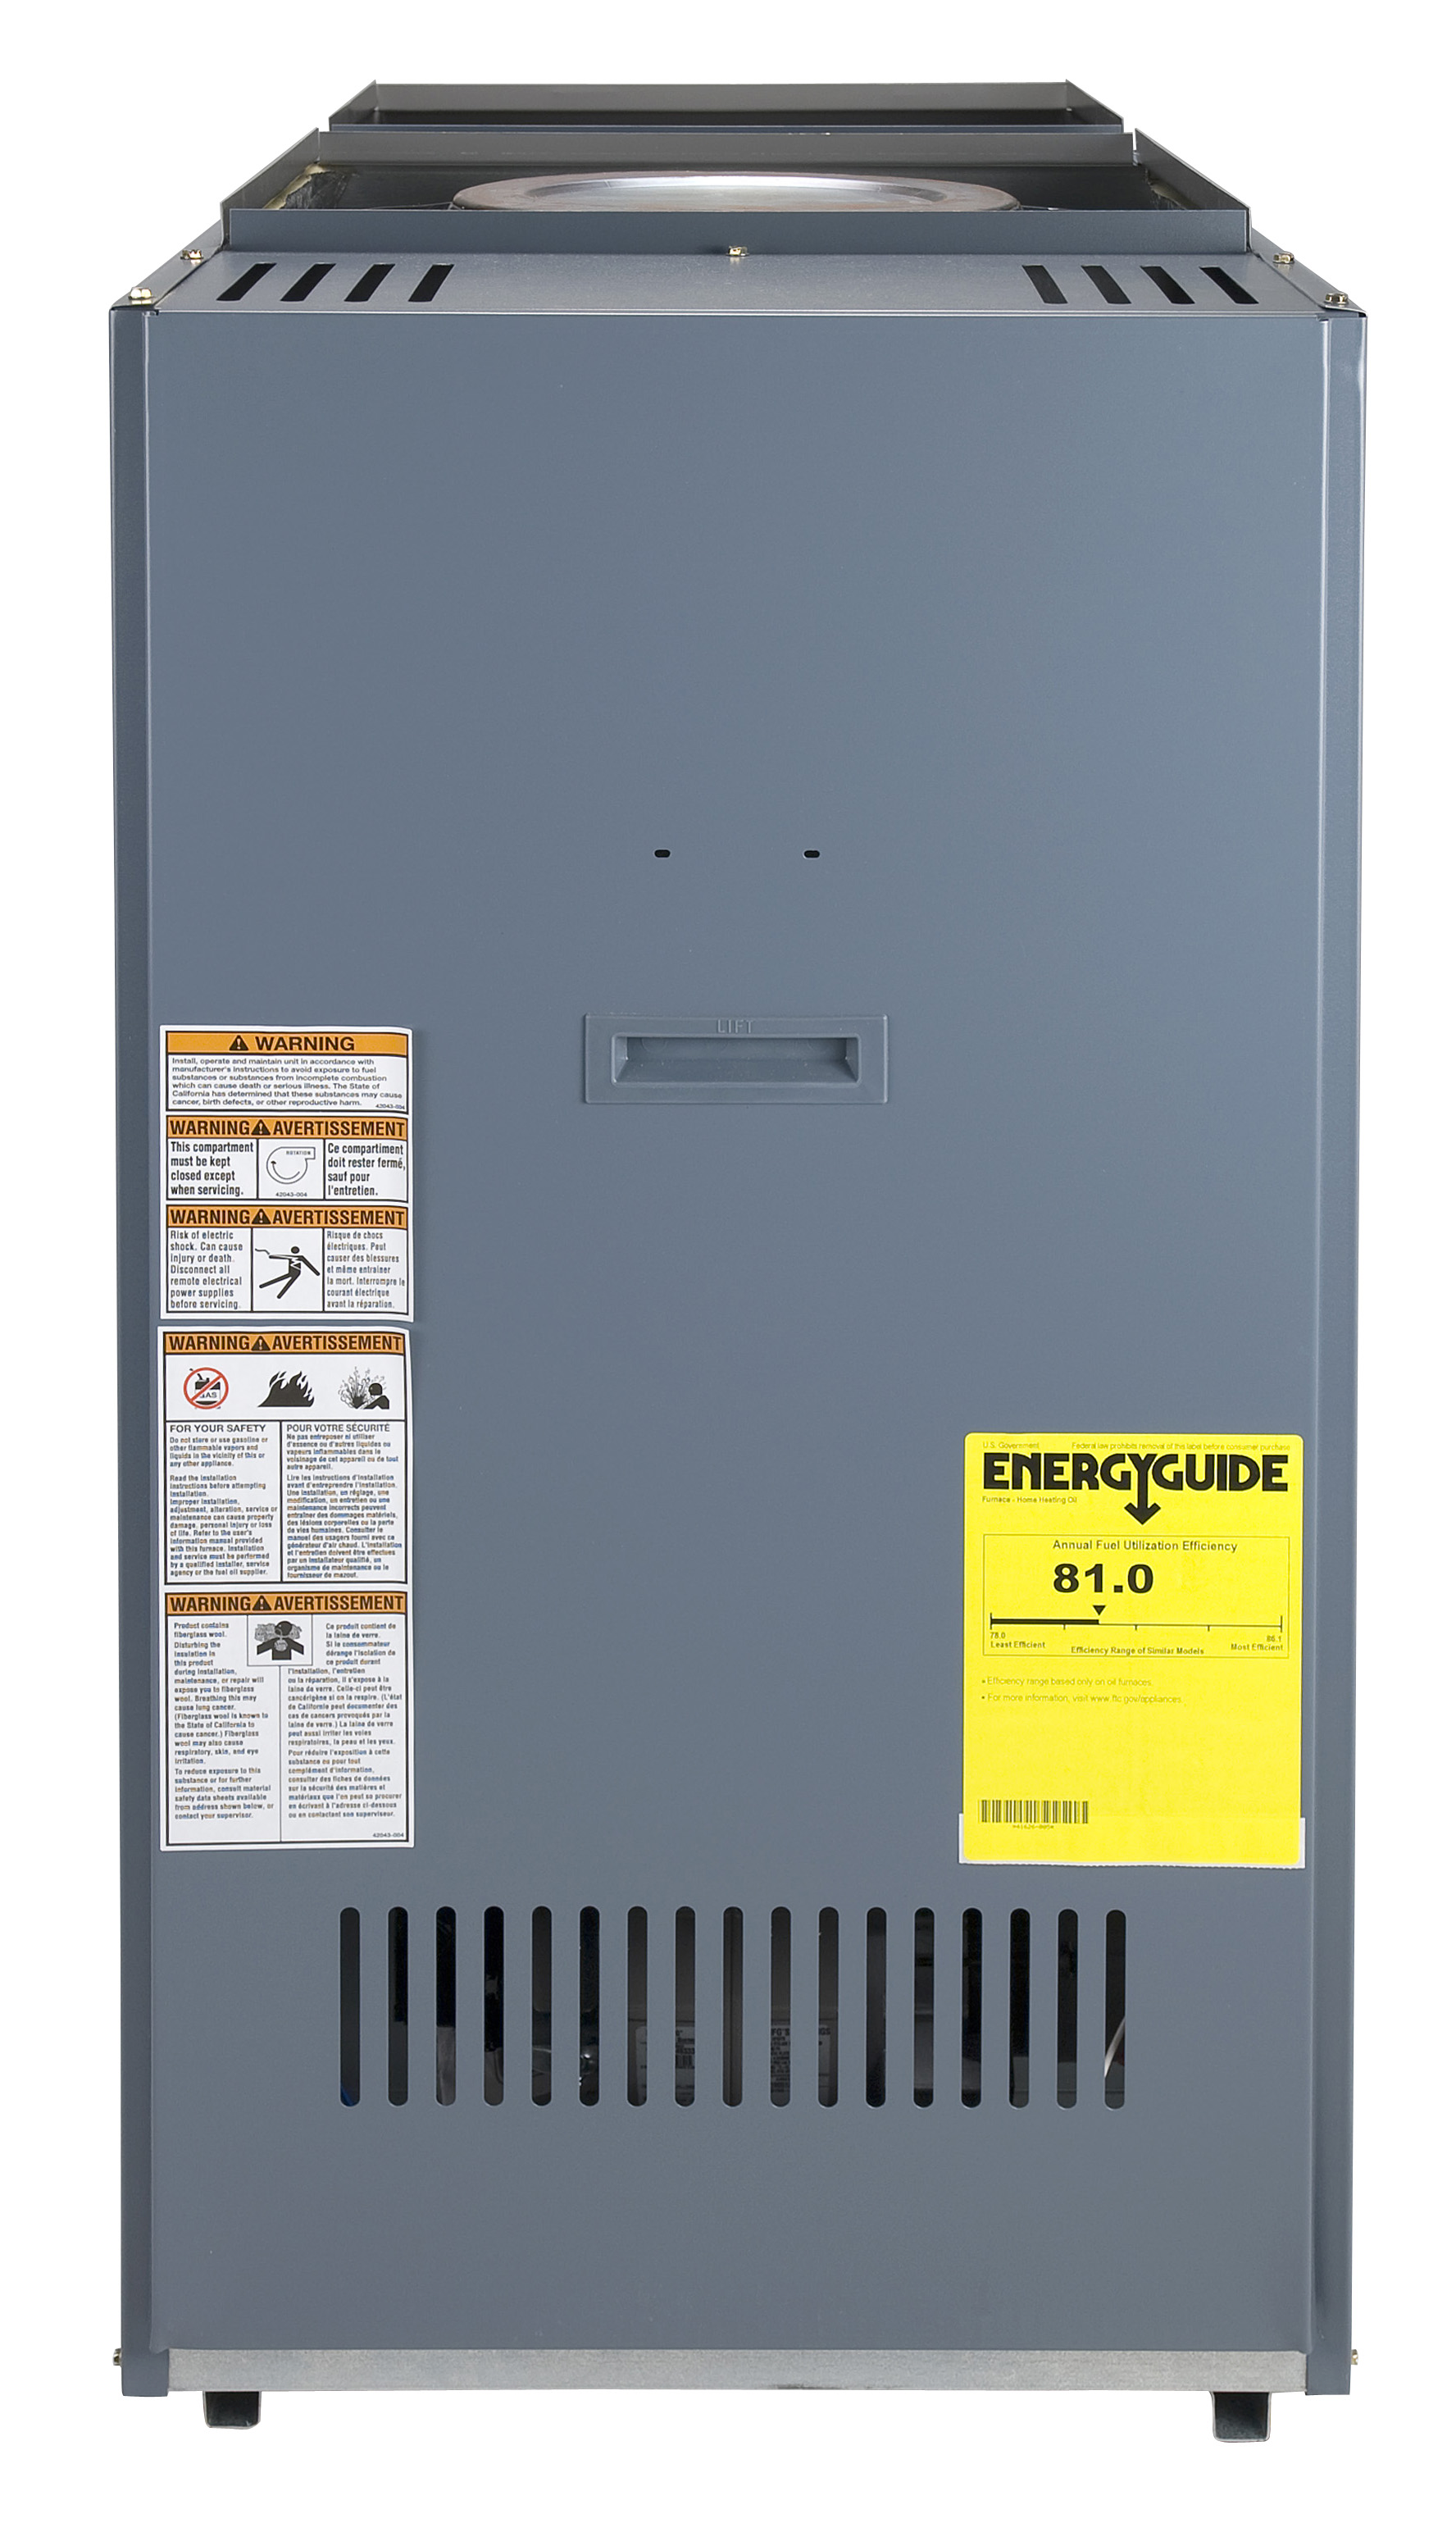 Comfort Aire Olrb125 D5 2a Lowboy Rear Flue 134 000 151 Input Oil Furnace Stack Control Wiring Diagram 134000 151000 Btu